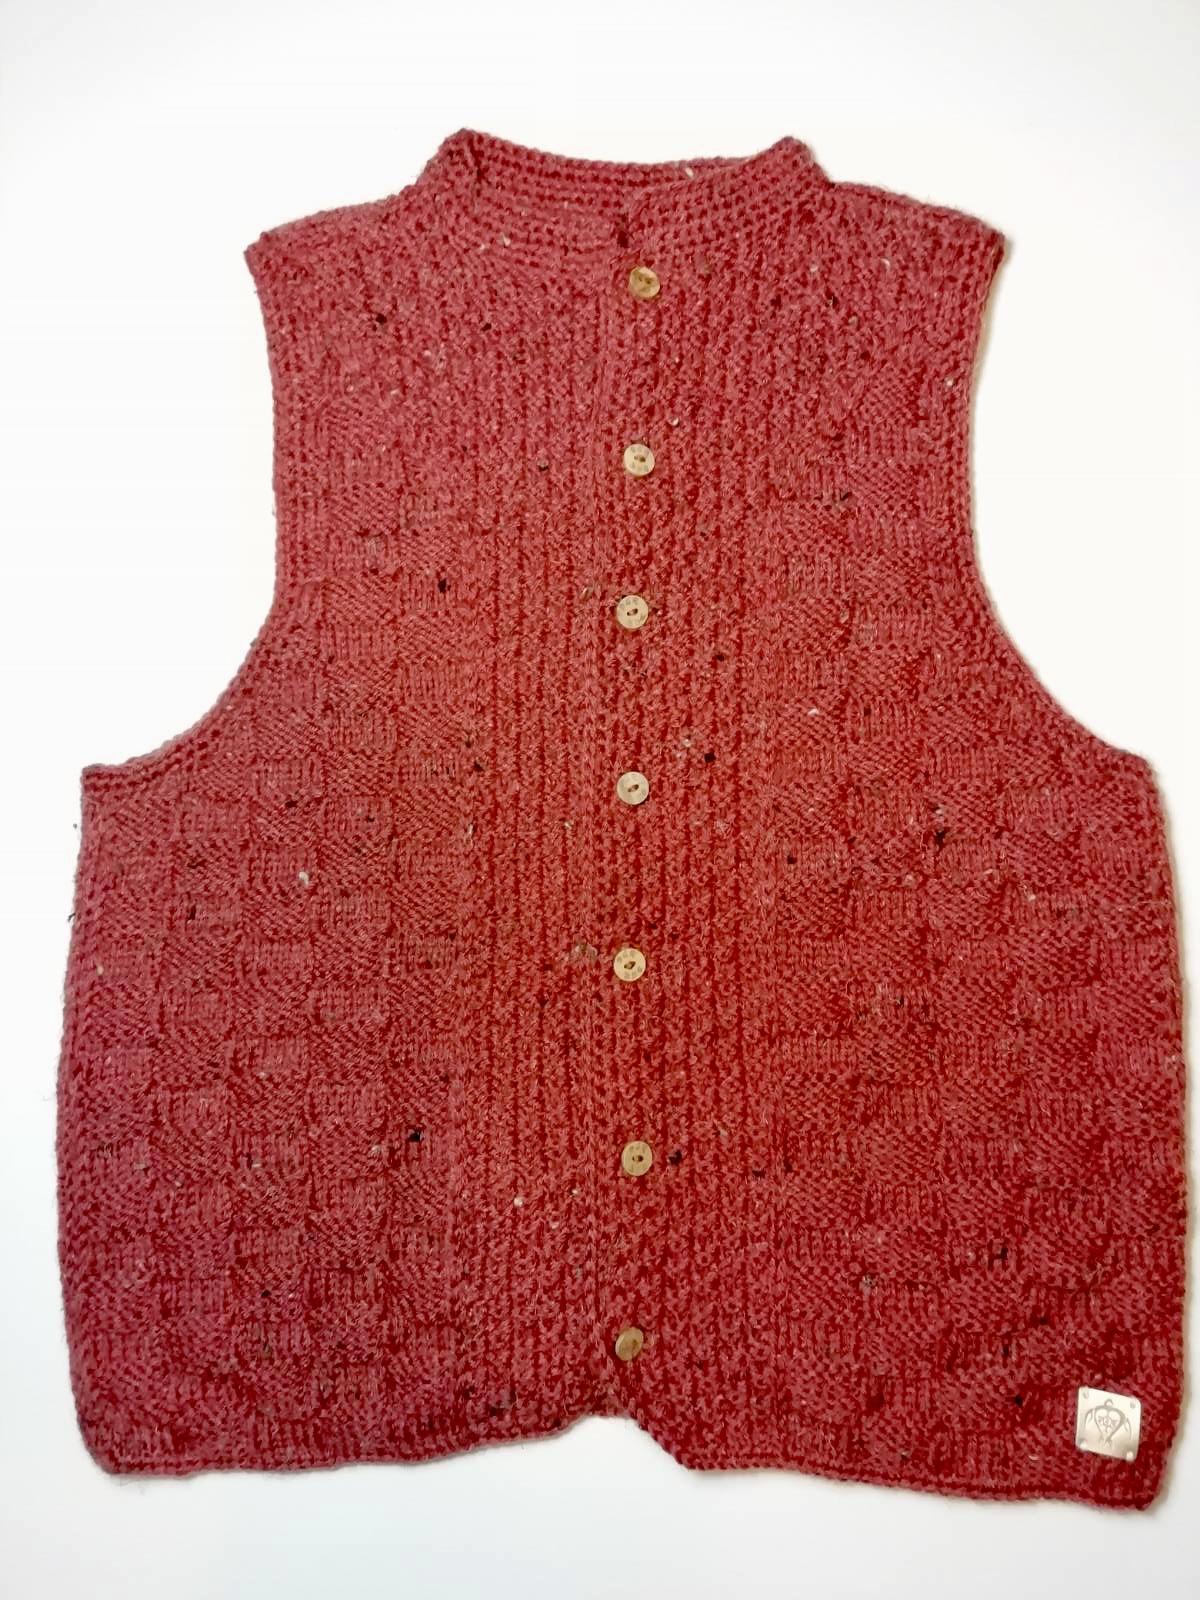 Handmade knitted vest maroon